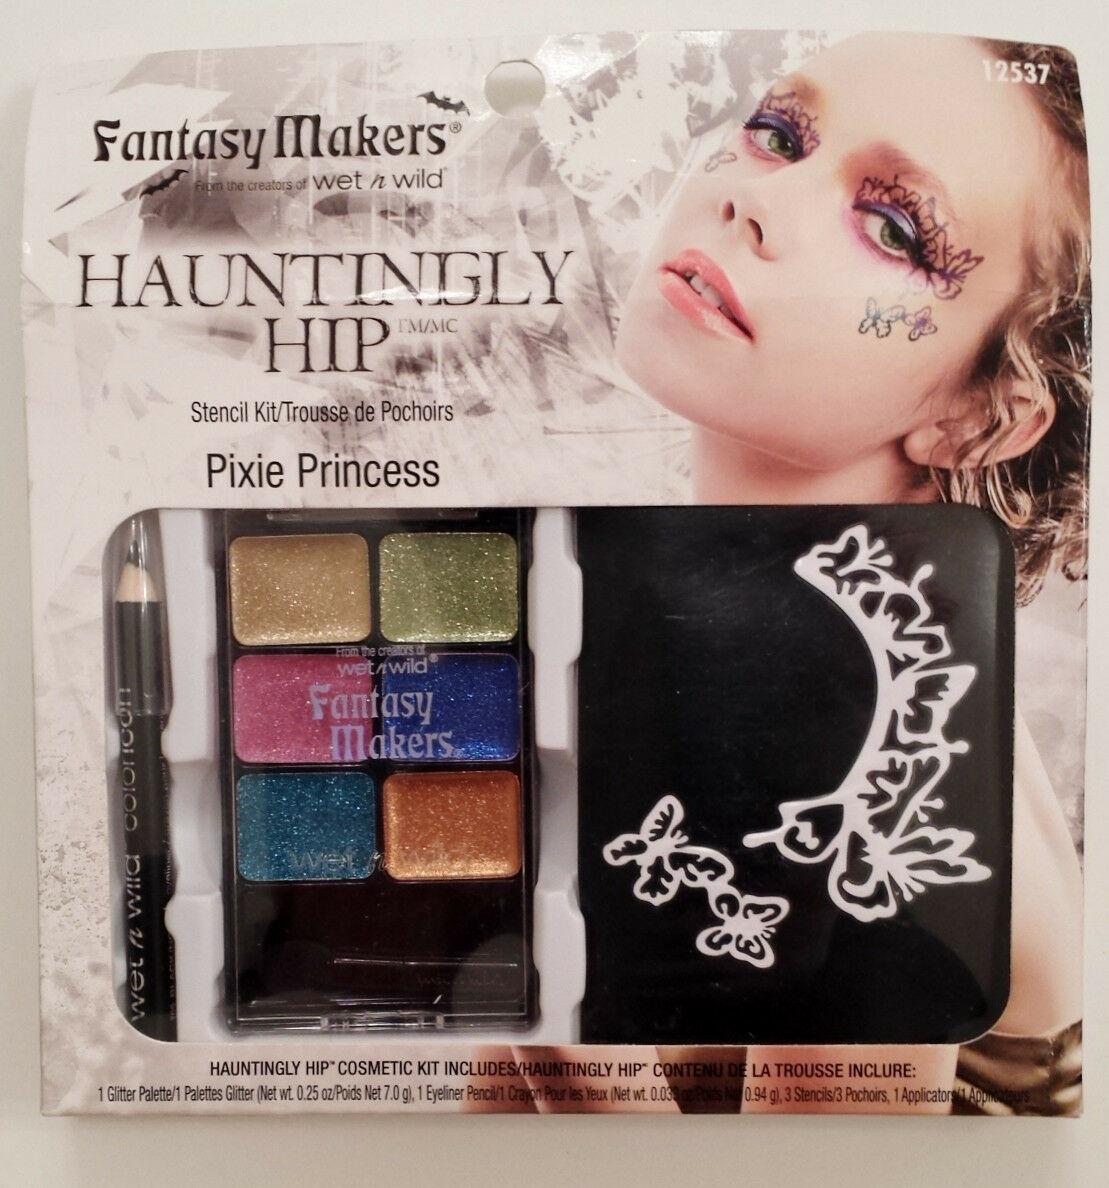 Wet N' Wild Fantasy Makers Hauntingly Hip Pixie Princess Stencil Make Up Kit - $4.99